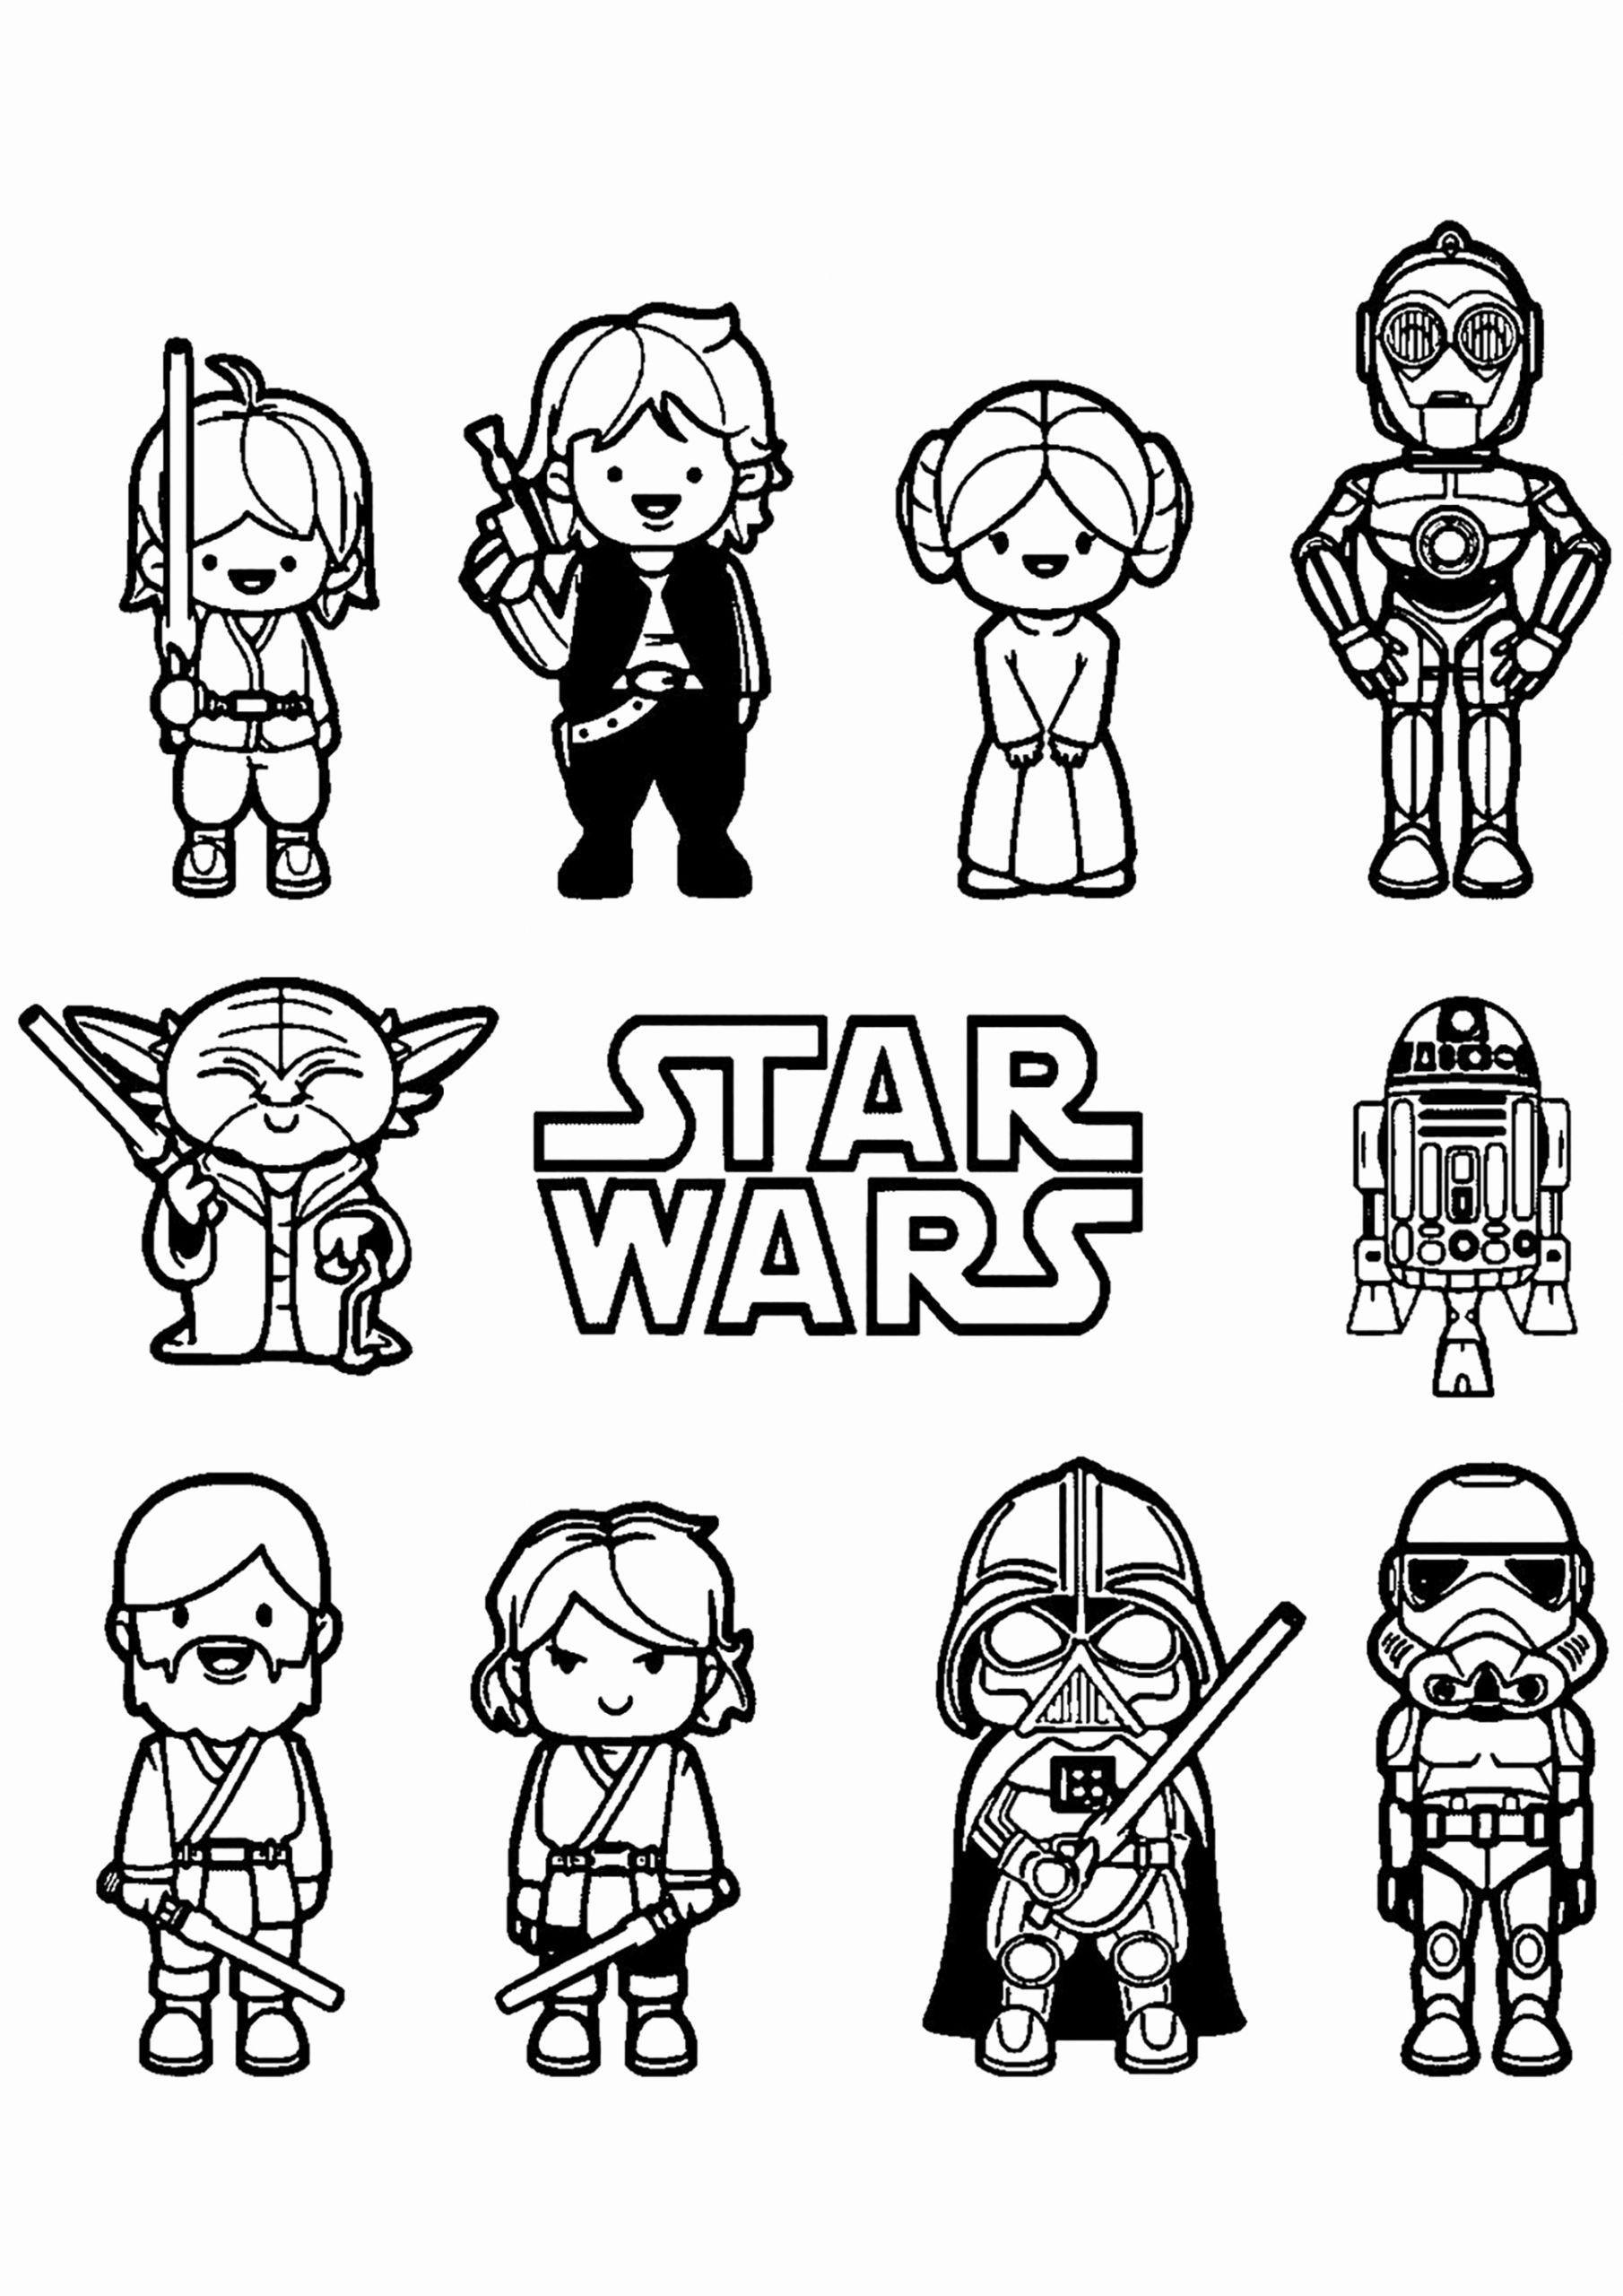 Star Wars Prints Star Wars Gifts 2020 Star Wars Coloring Sheet Star Wars Coloring Book Star Wars Cartoon